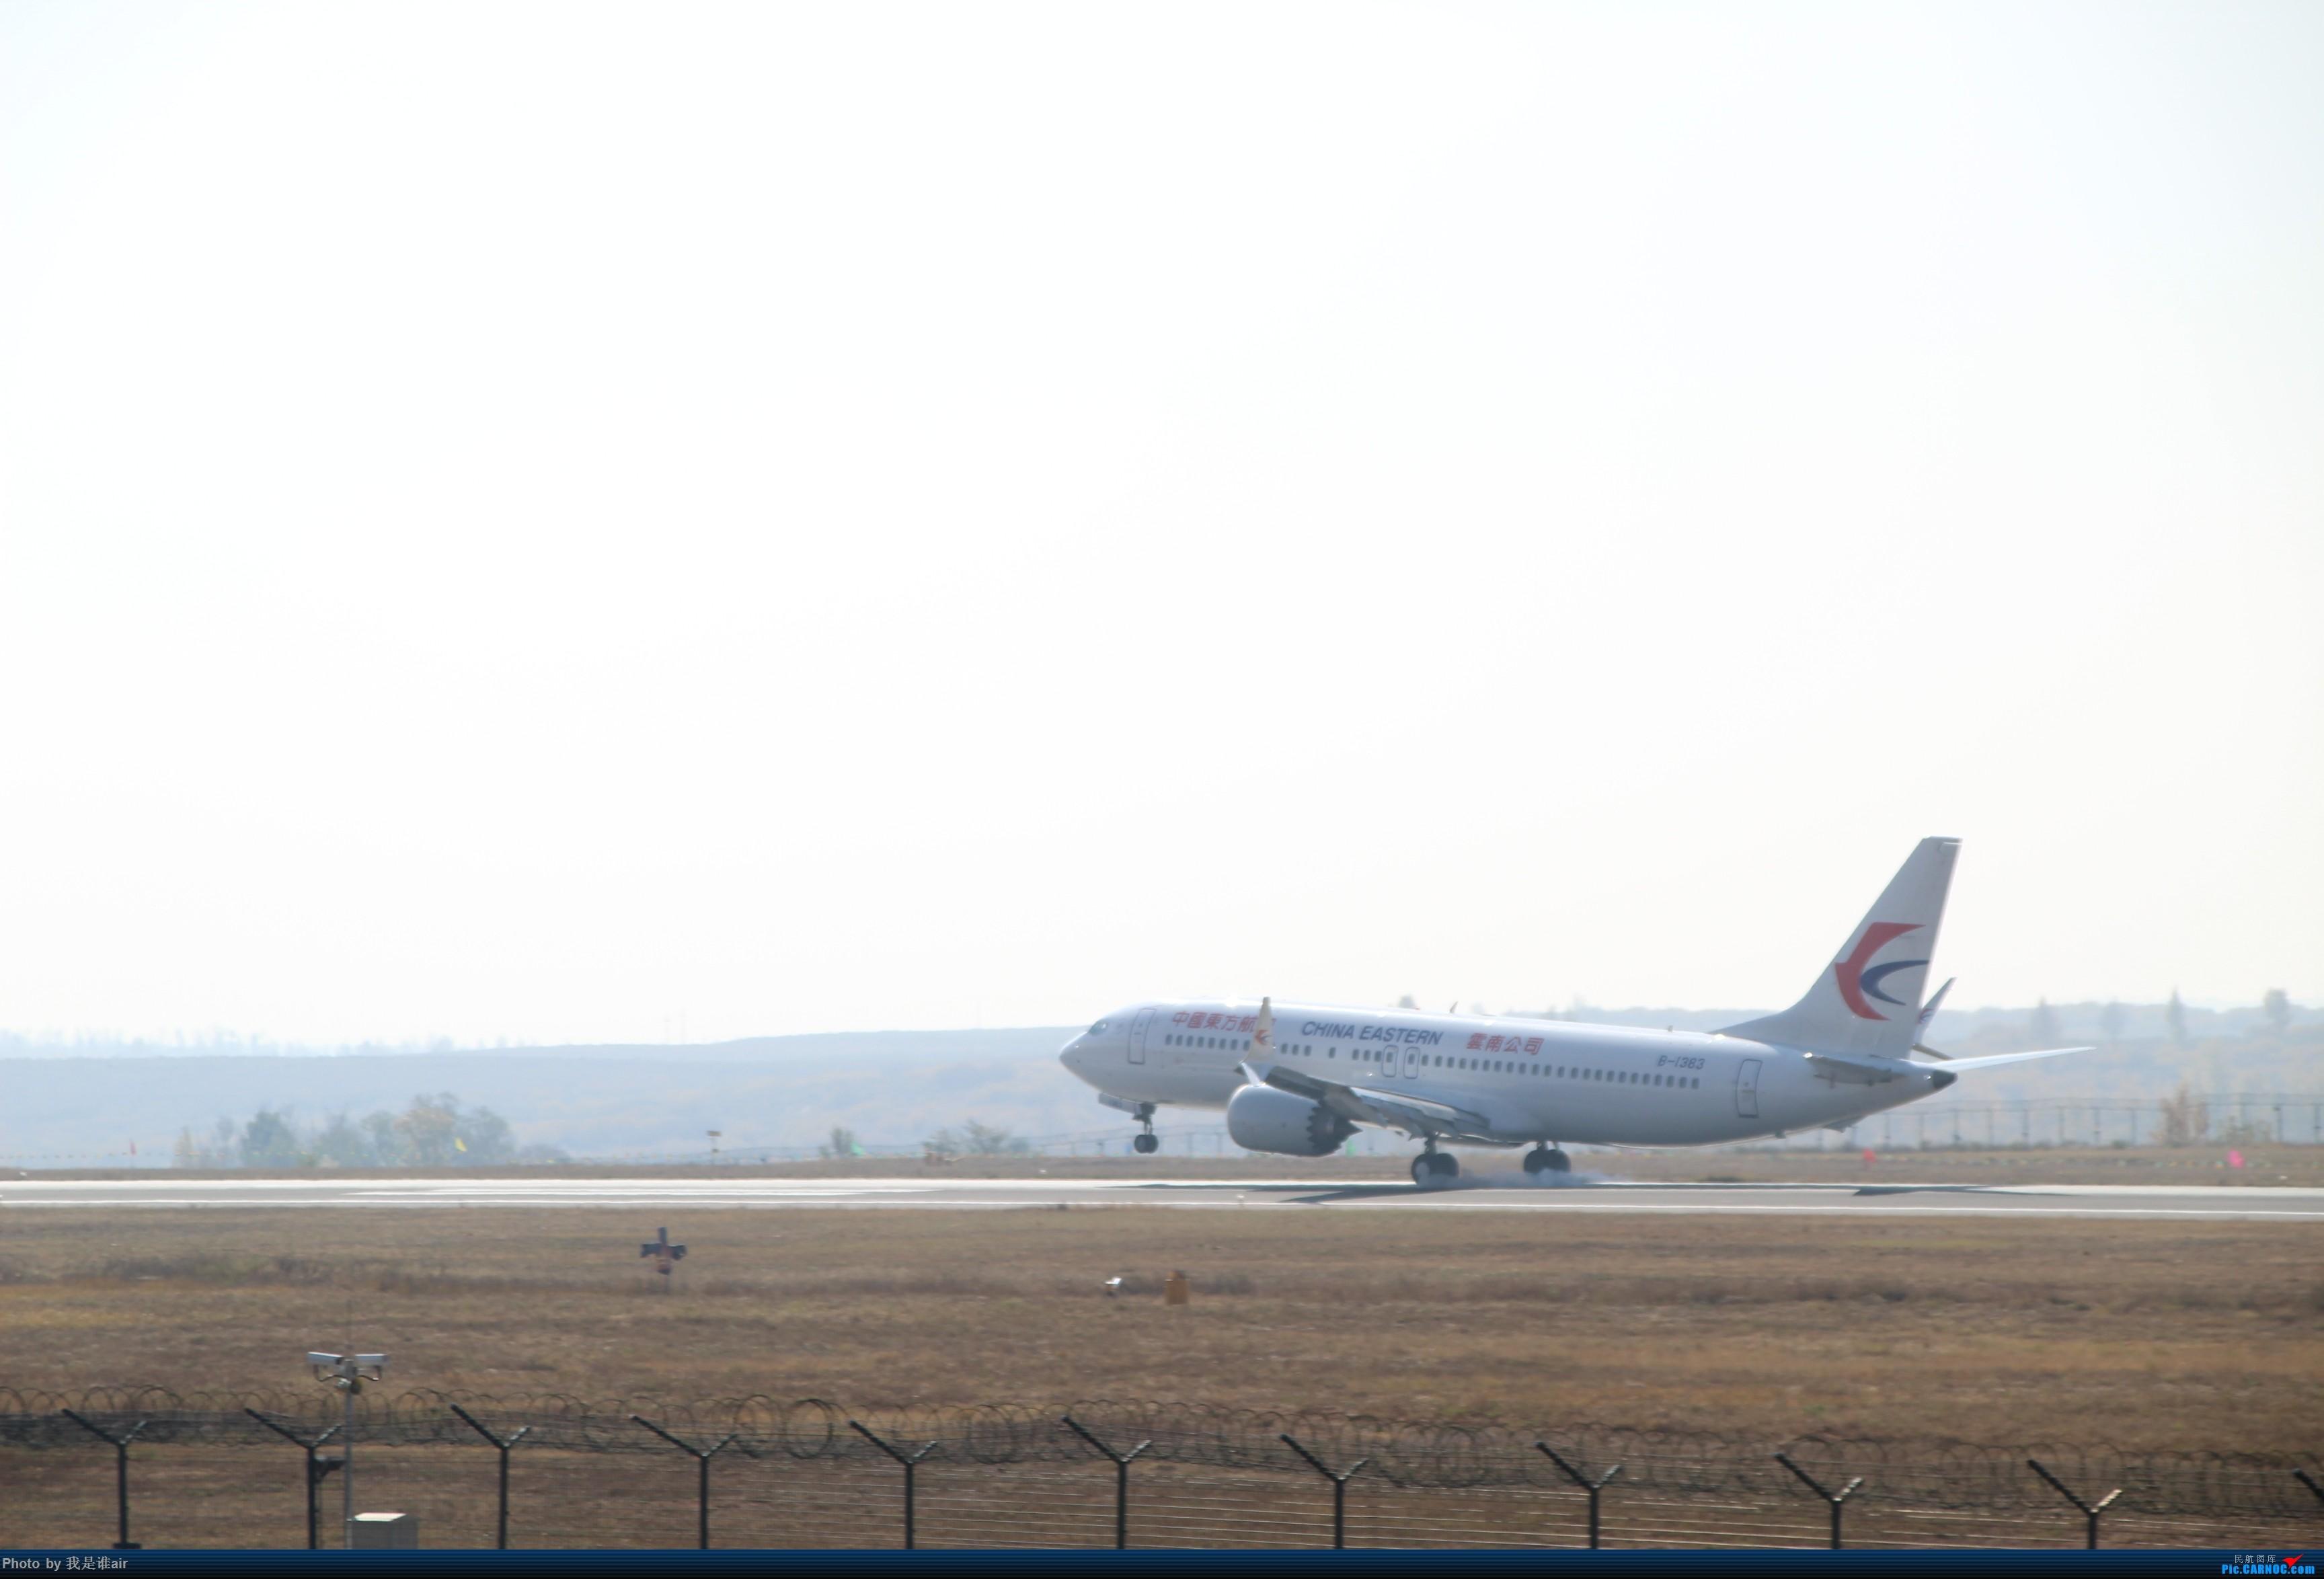 Re:[原创]ZBDS拍到擦烟 BOEING 737MAX-8 B-1383 中国鄂尔多斯伊金霍洛机场